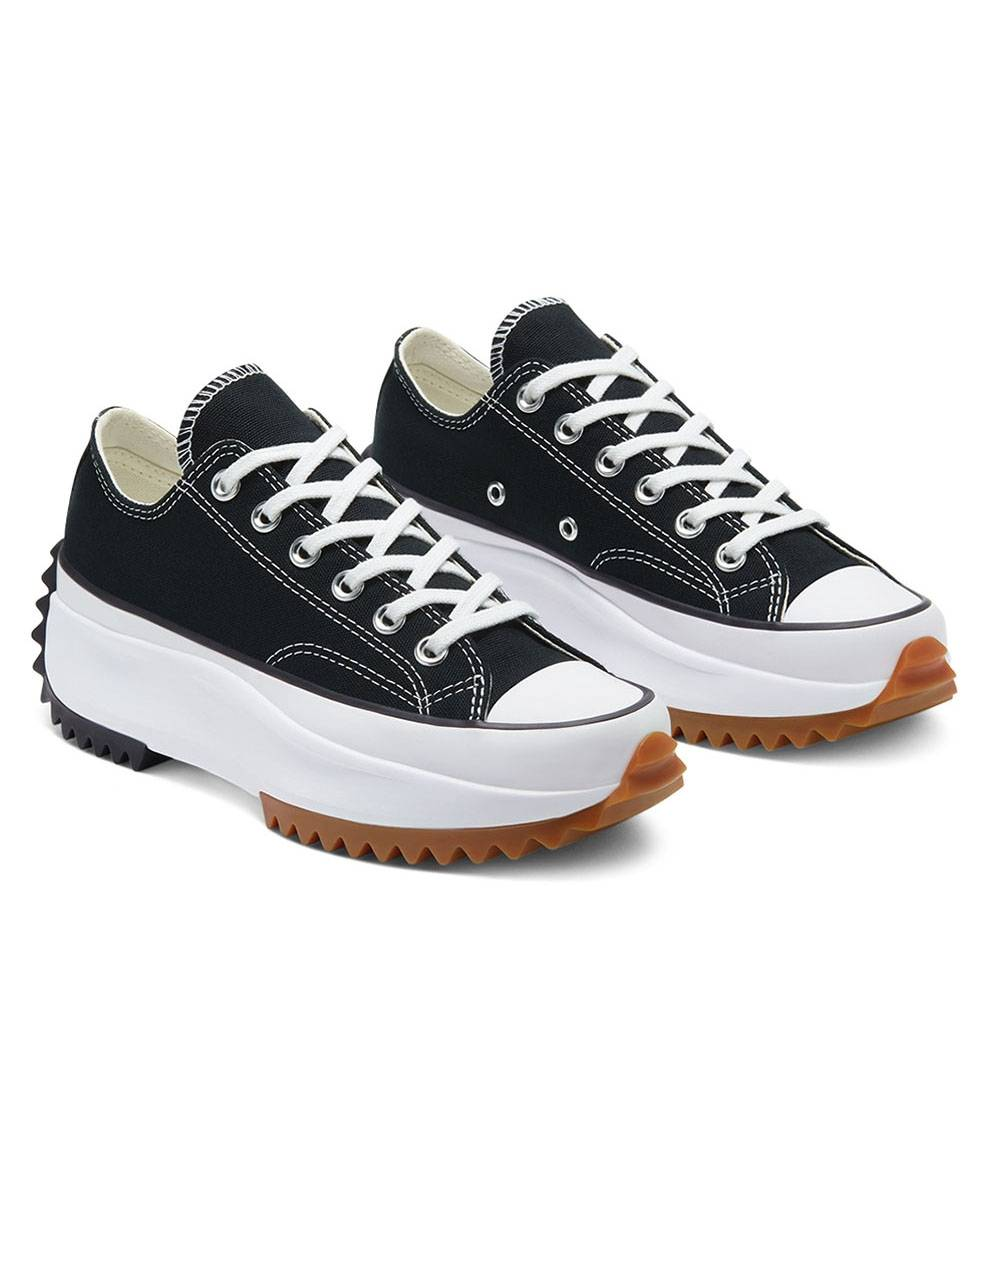 Converse Woman Run Star Hike low - black/white/gum Converse Sneakers 90,16€